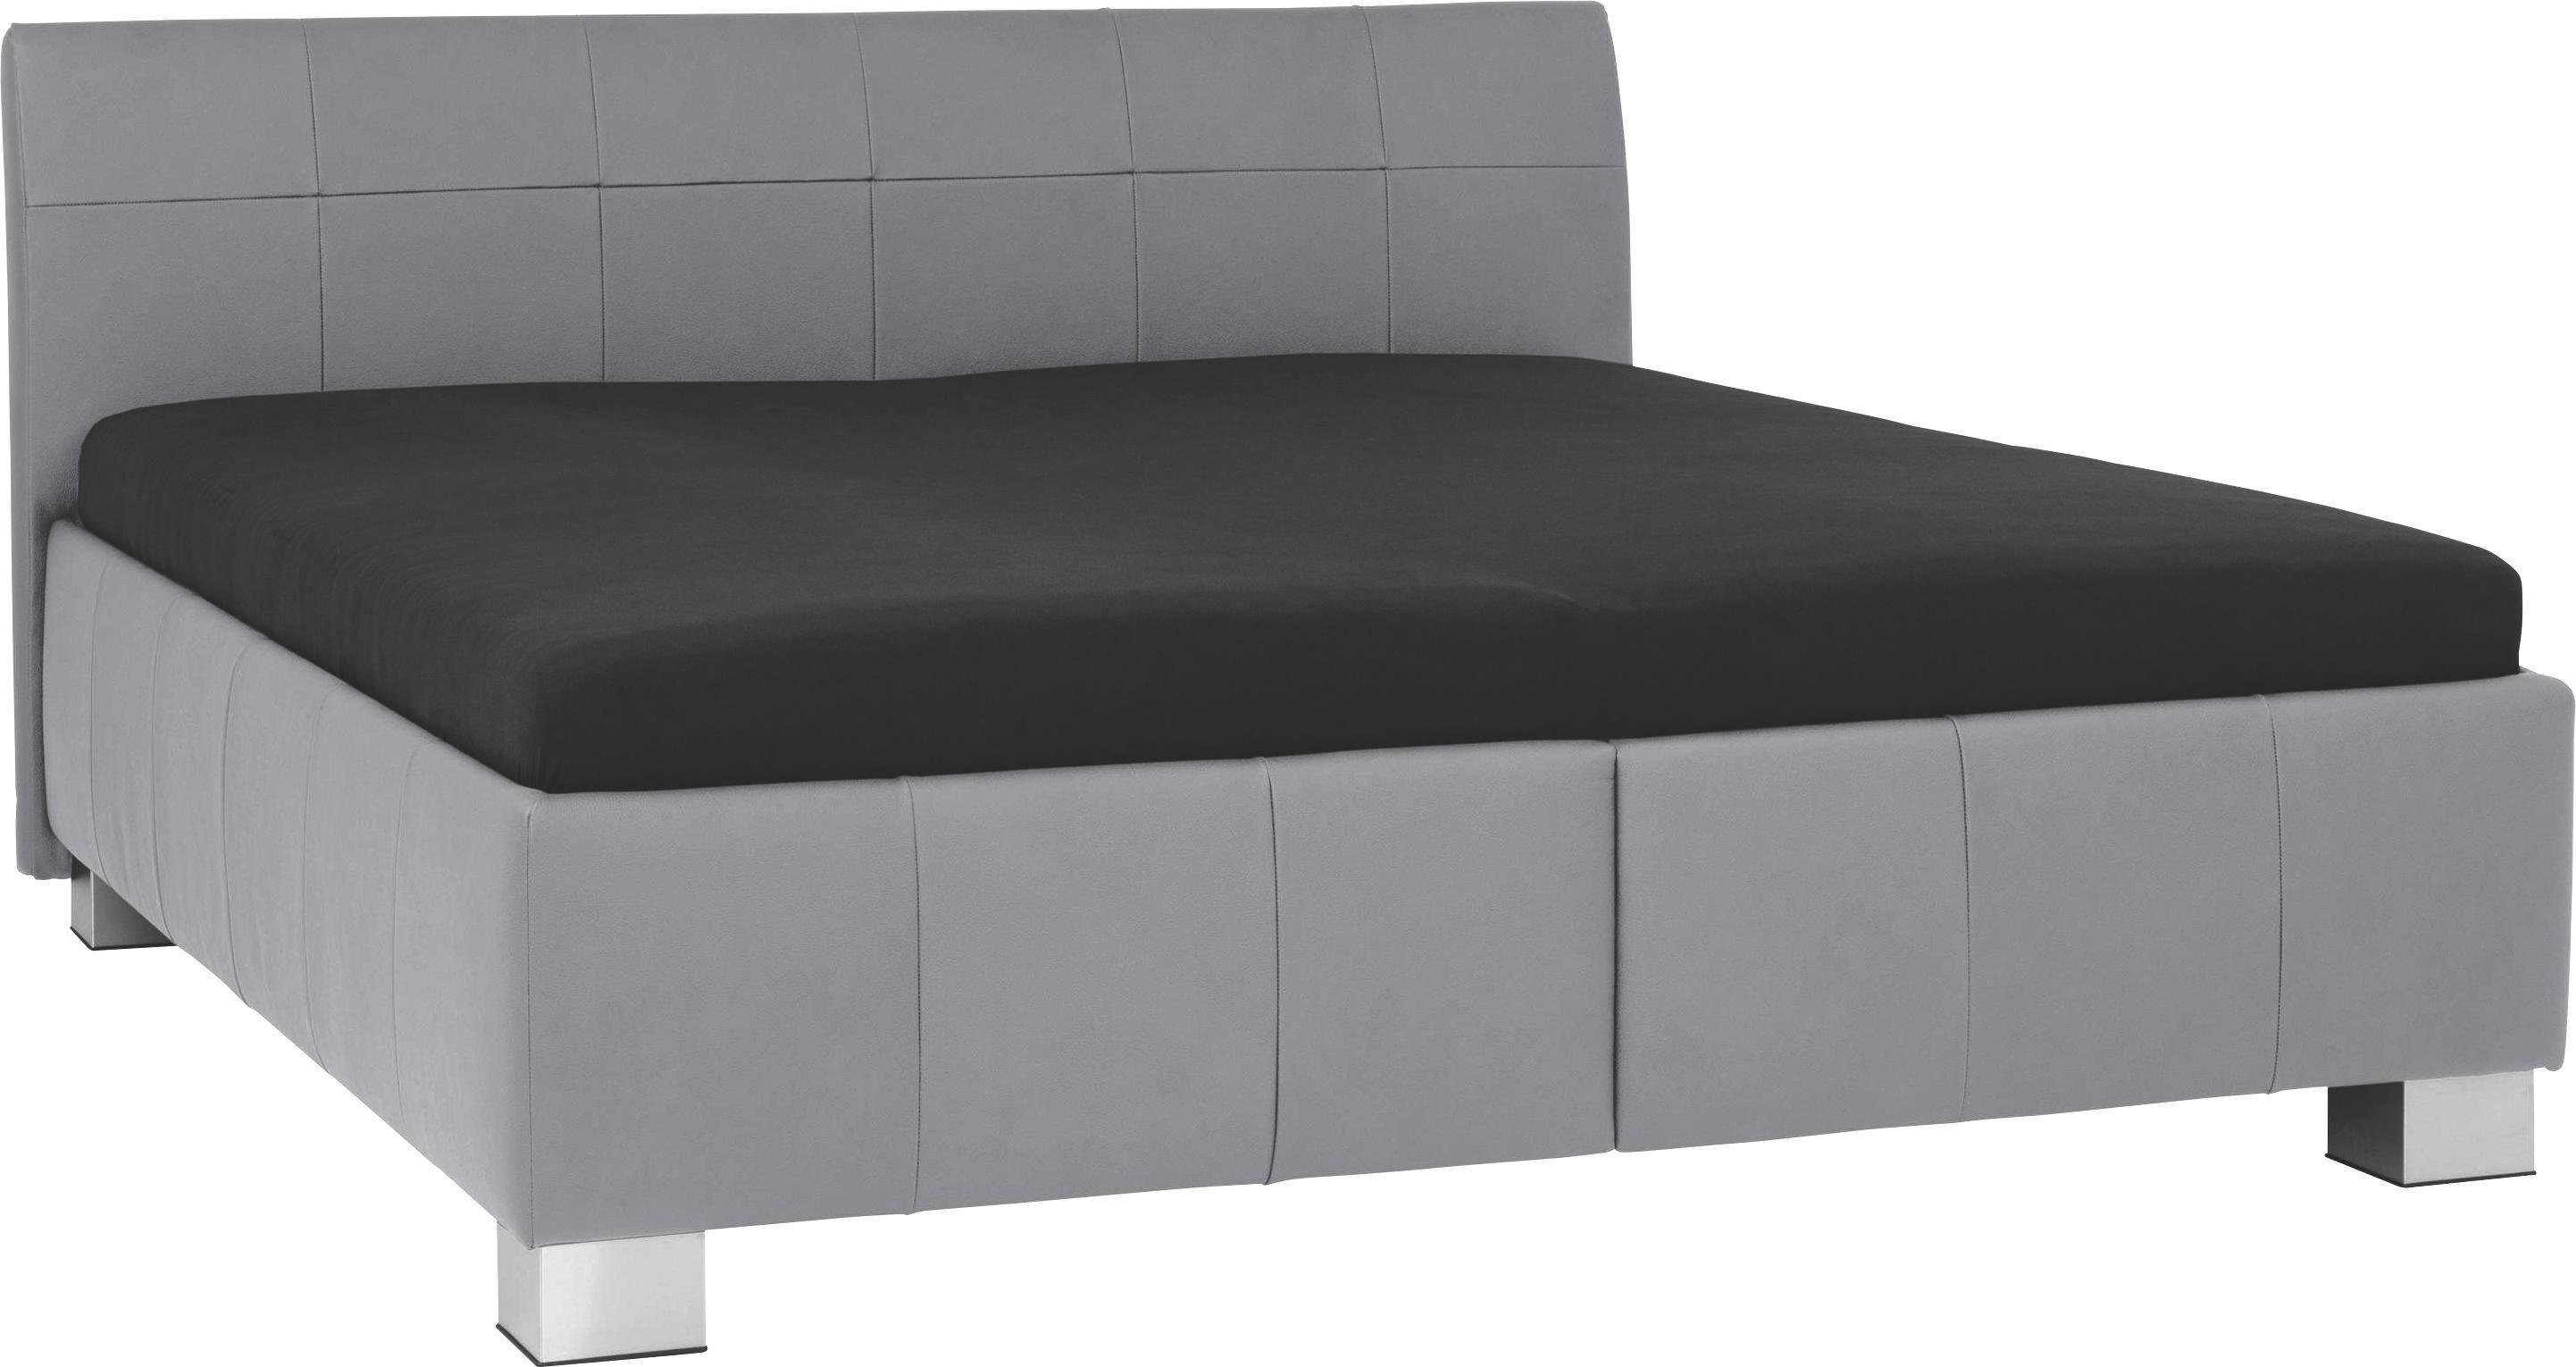 POLSTERBETT 180/200 cm - Silberfarben/Grau, KONVENTIONELL, Leder/Textil (180/200cm) - XORA